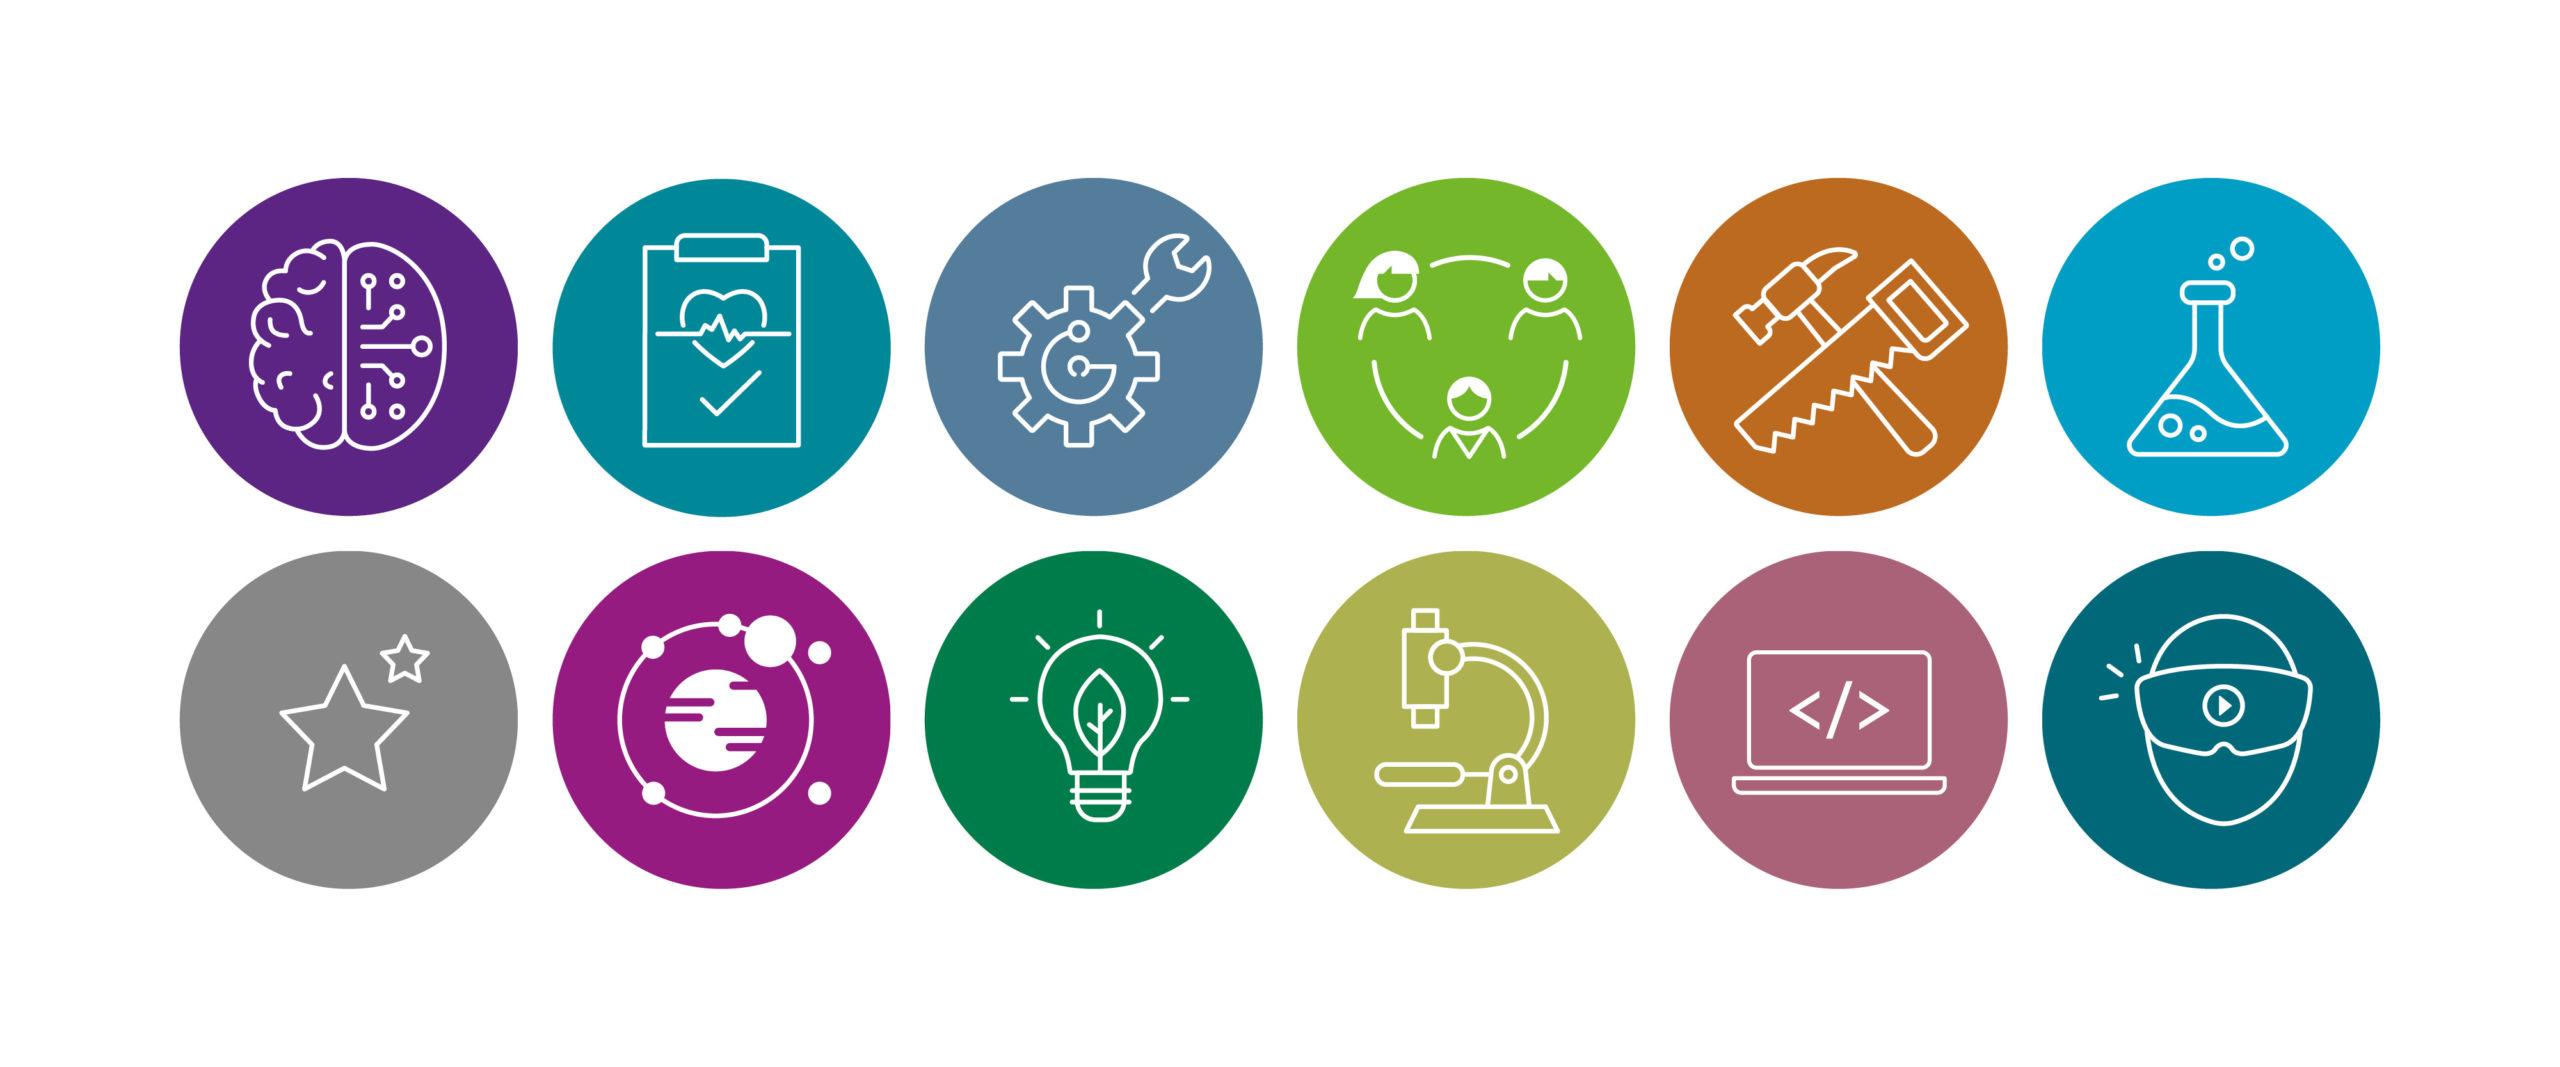 LOOK_CoSA_CenterofScienceActivities_Leitsystem_web_Icons_c_look design